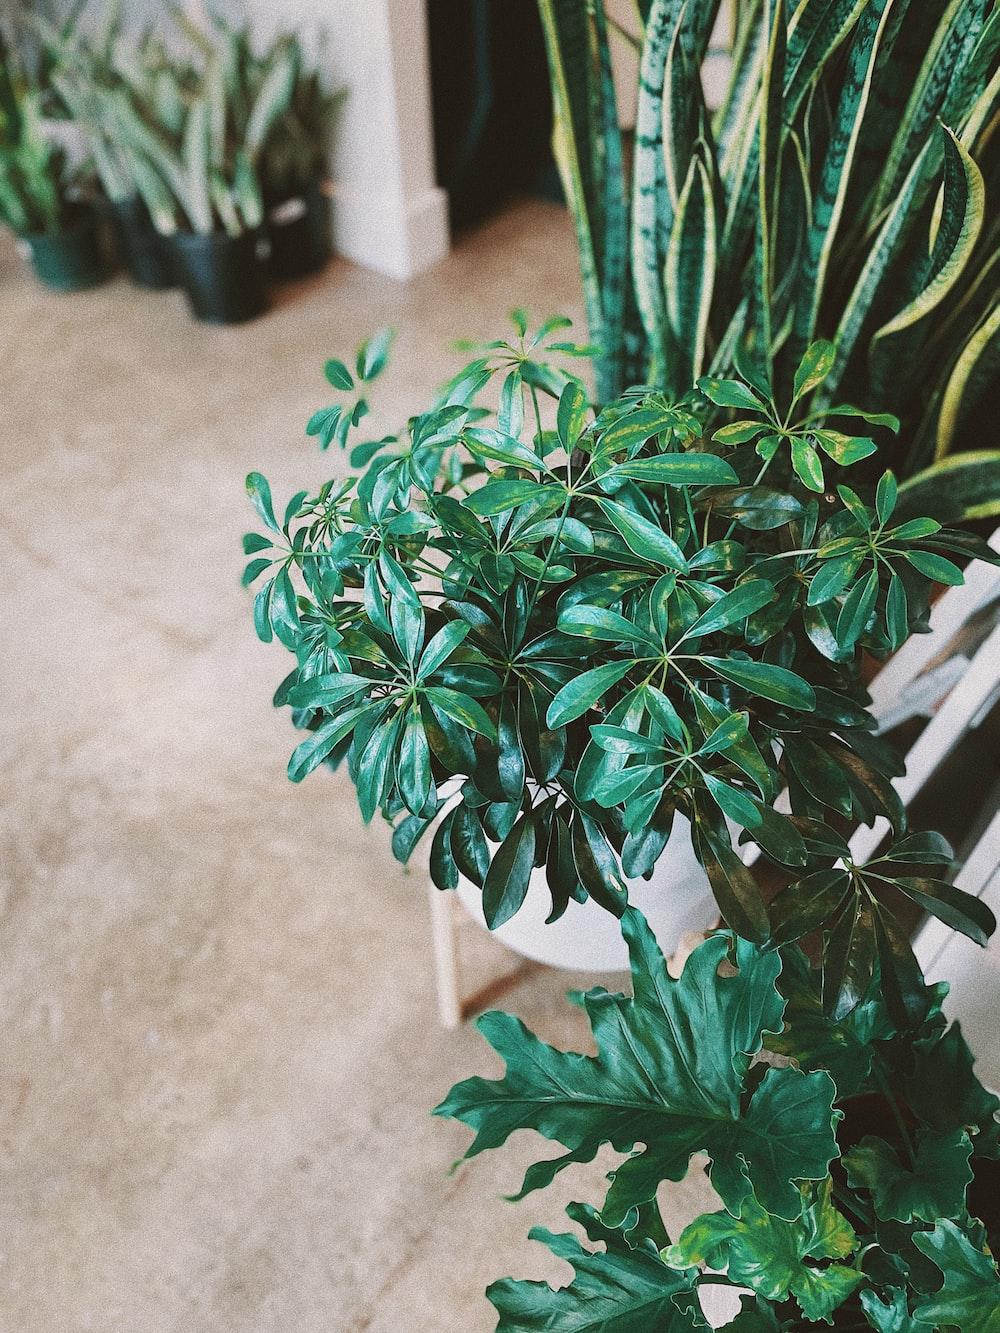 green plant on white concrete floor